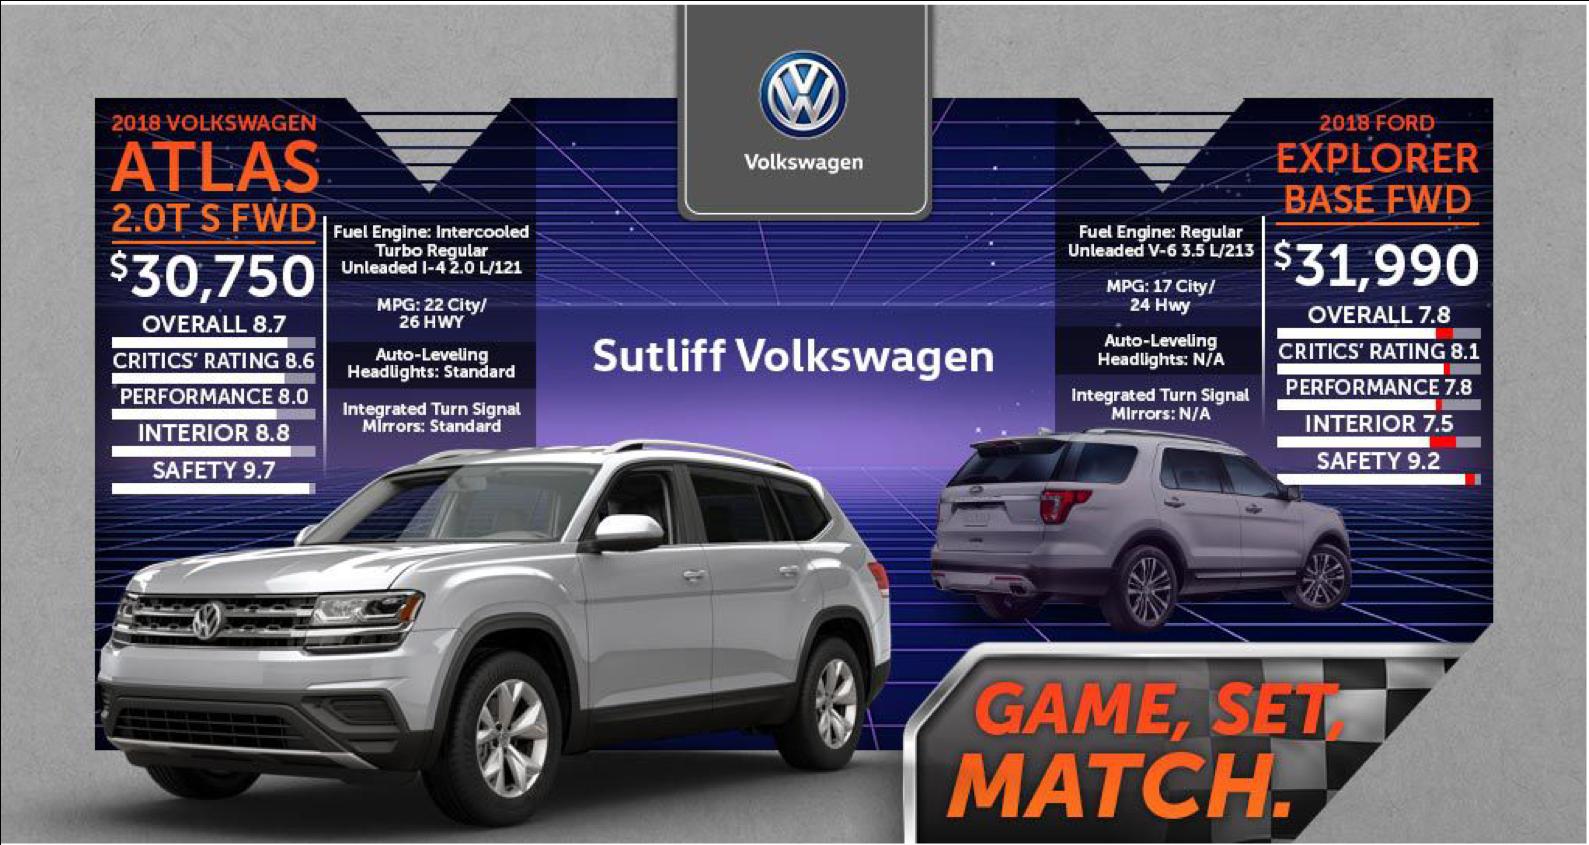 2018 Volkswagen Atlas Vs. 2018 Ford Explorer